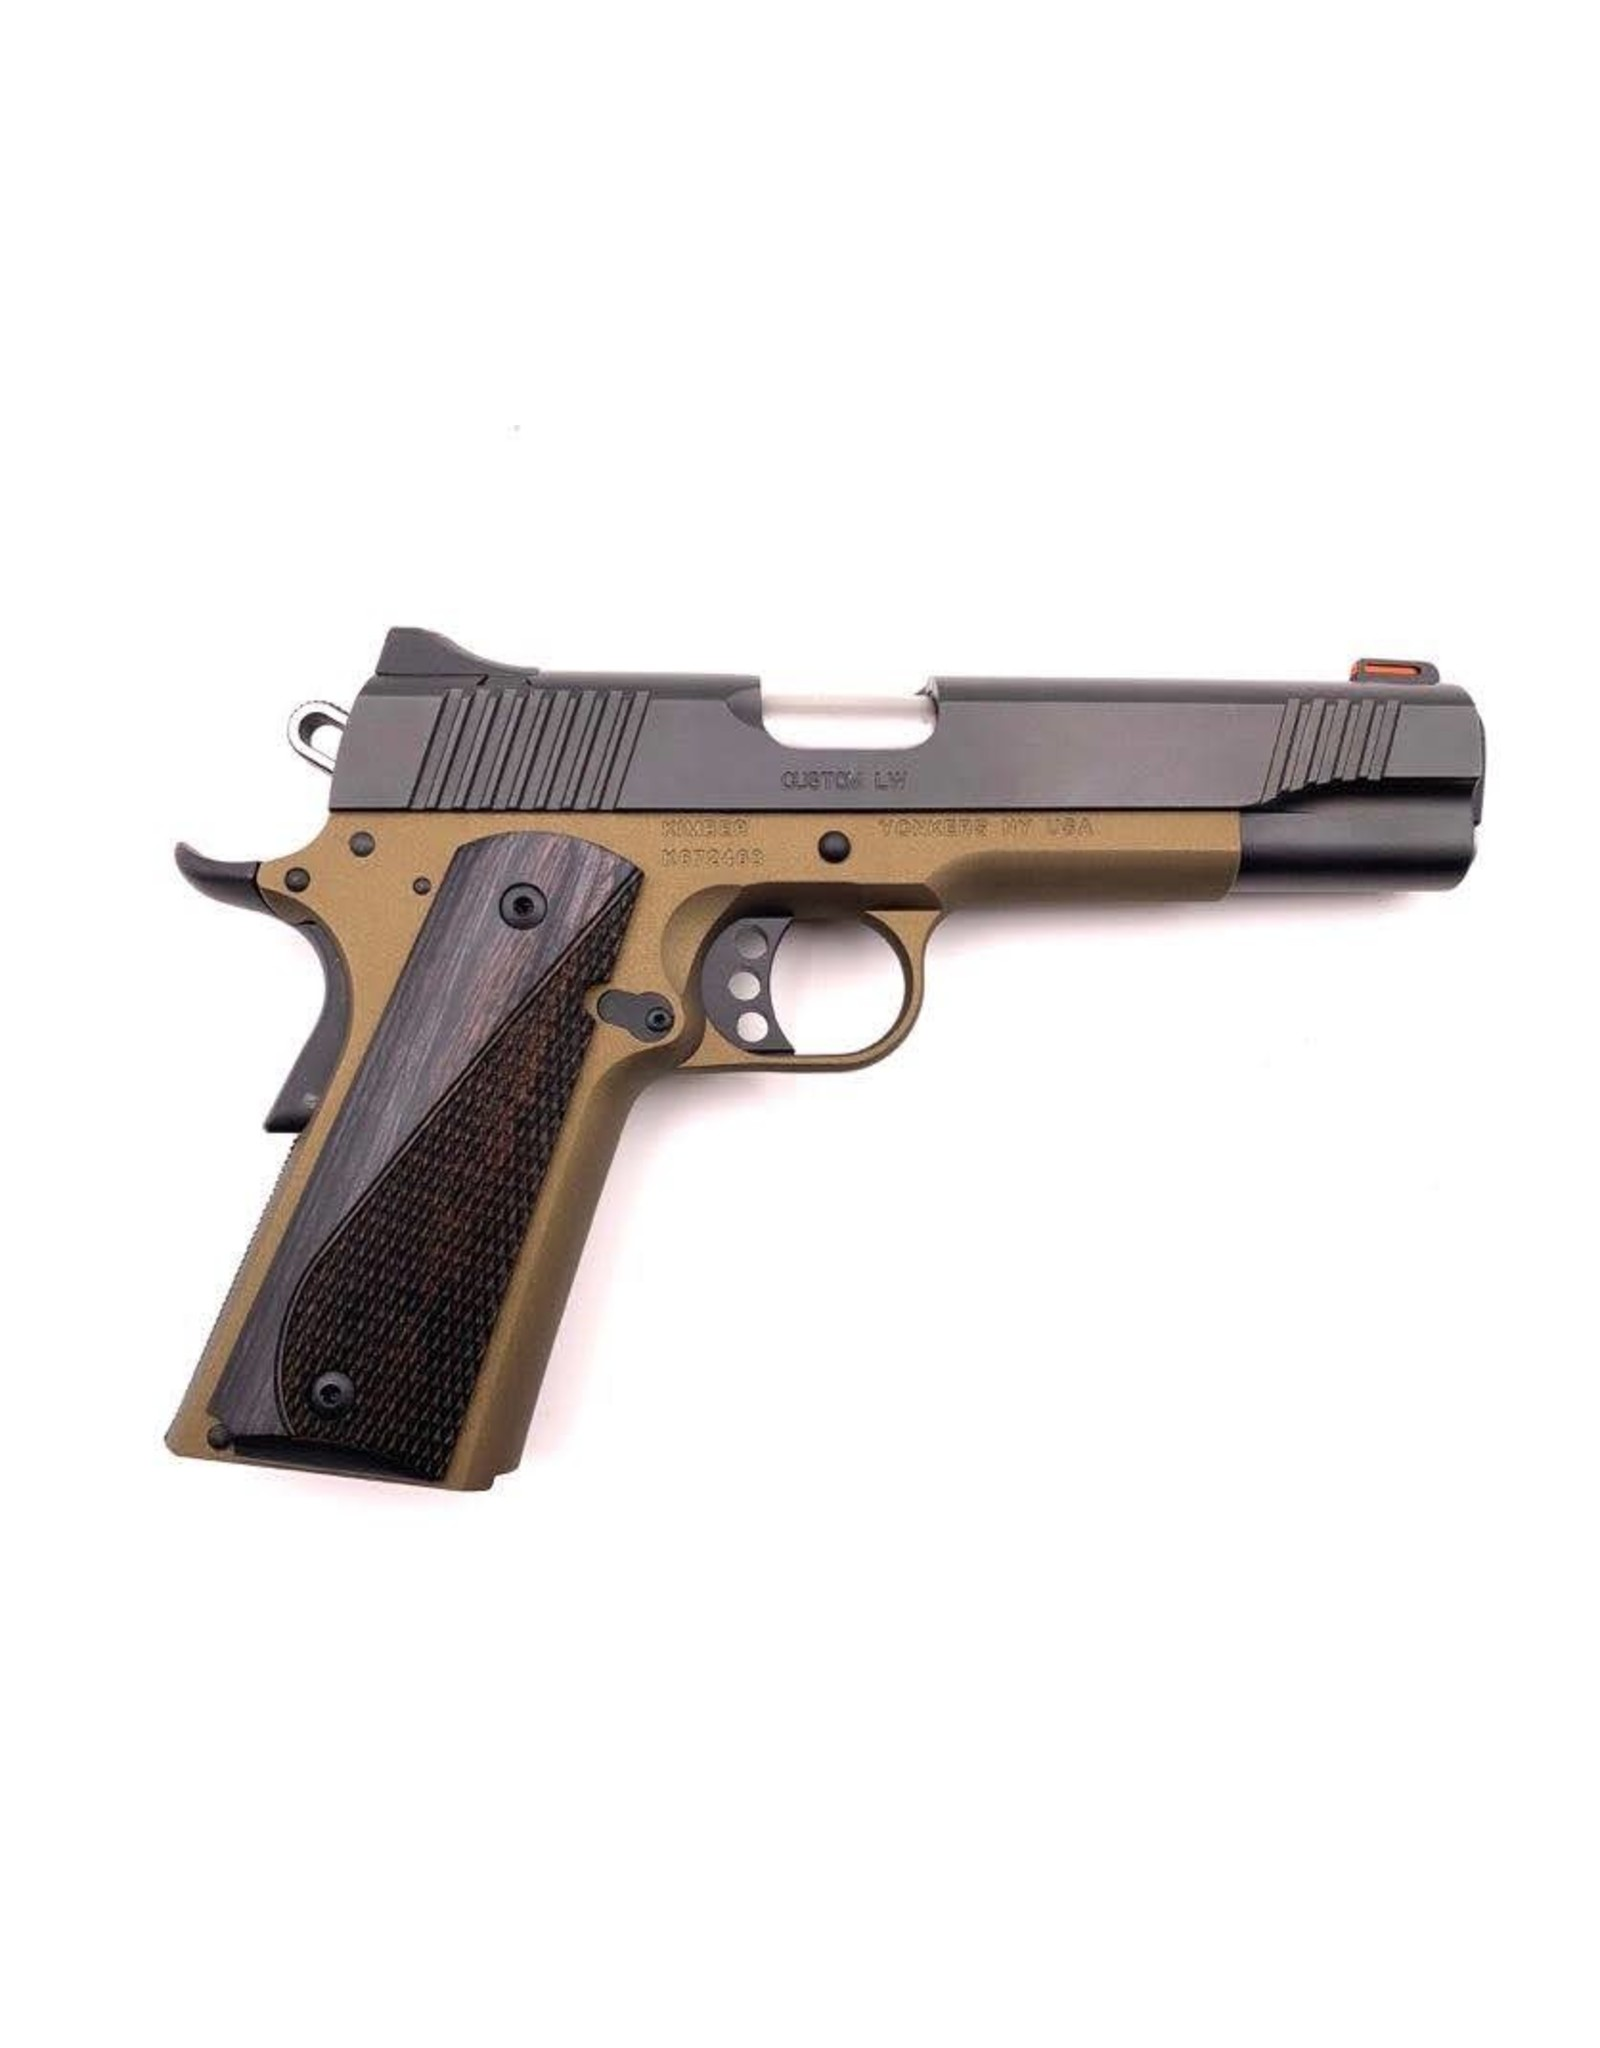 "Kimber Kimber 1911 Custom LW .45 ACP, 5"", Burnt Bronze/Black Two-Tone - Complete Pistol"